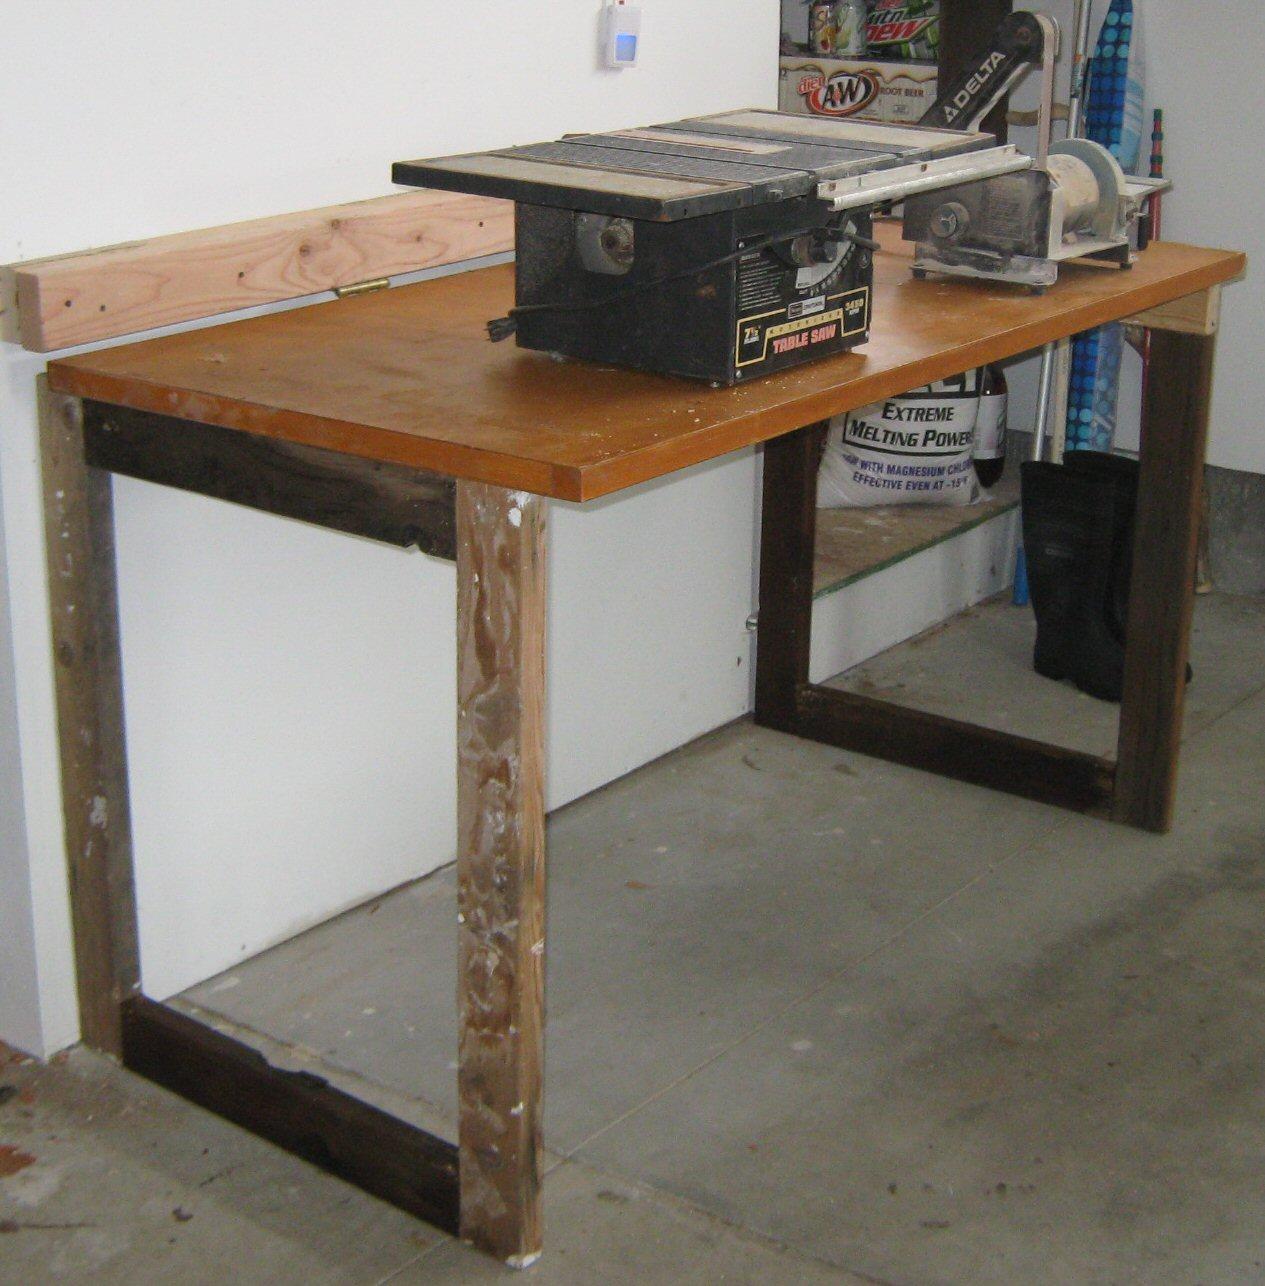 Folding Garage Counter from a door.